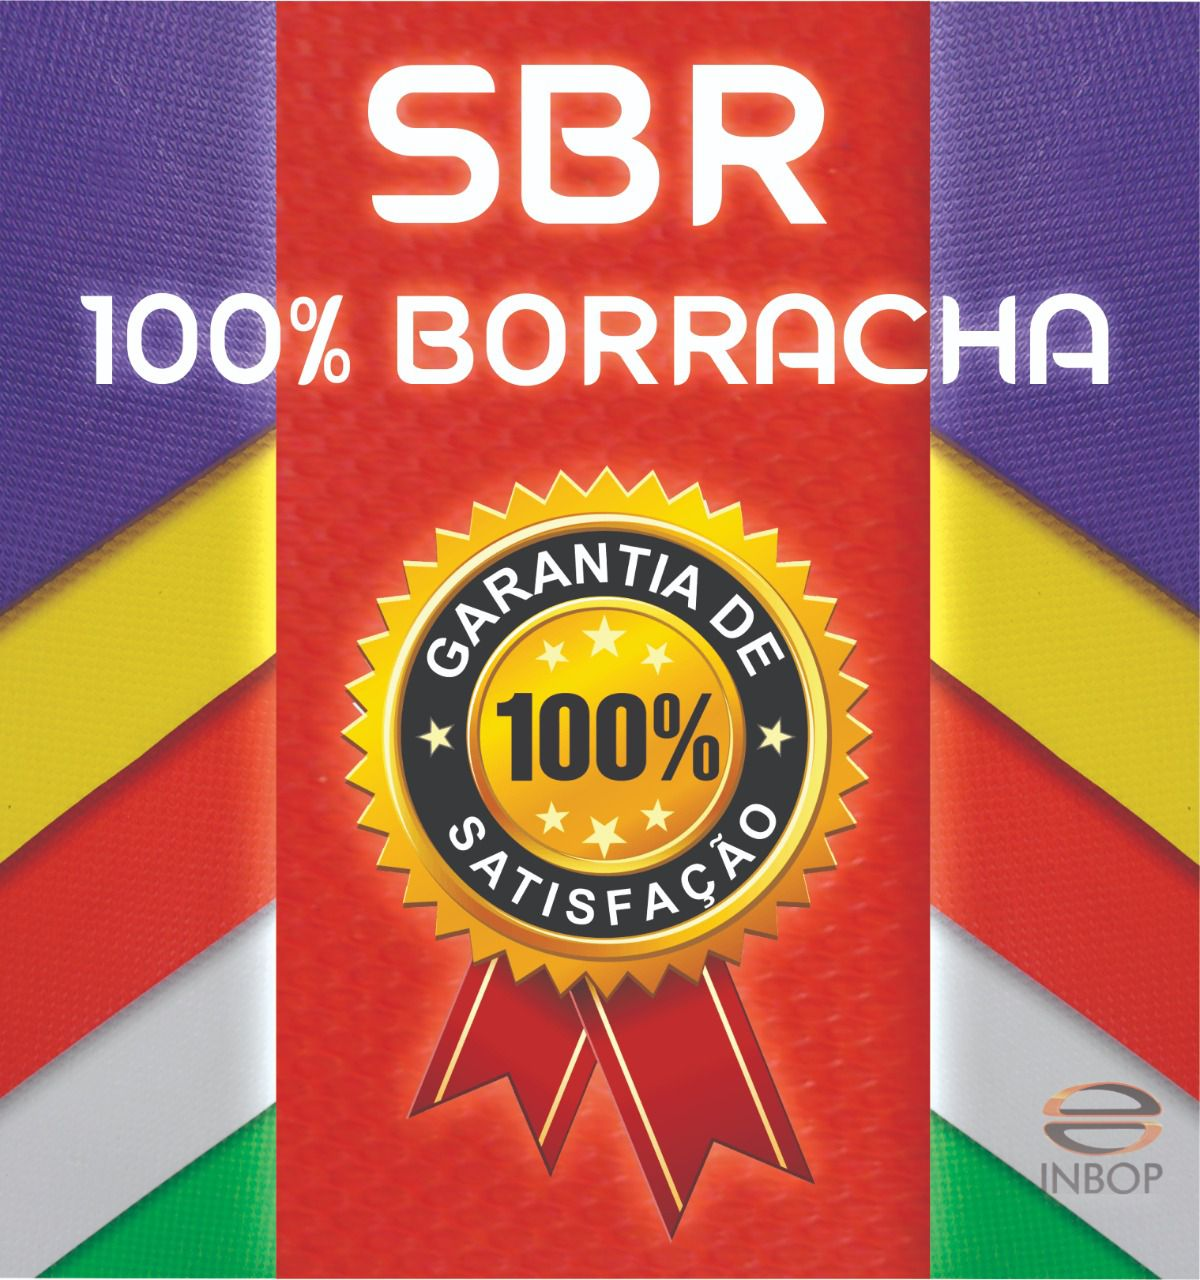 Placa 100% Borracha SBR FLAT - 1,20 x 0,80 - Espessura 11MM